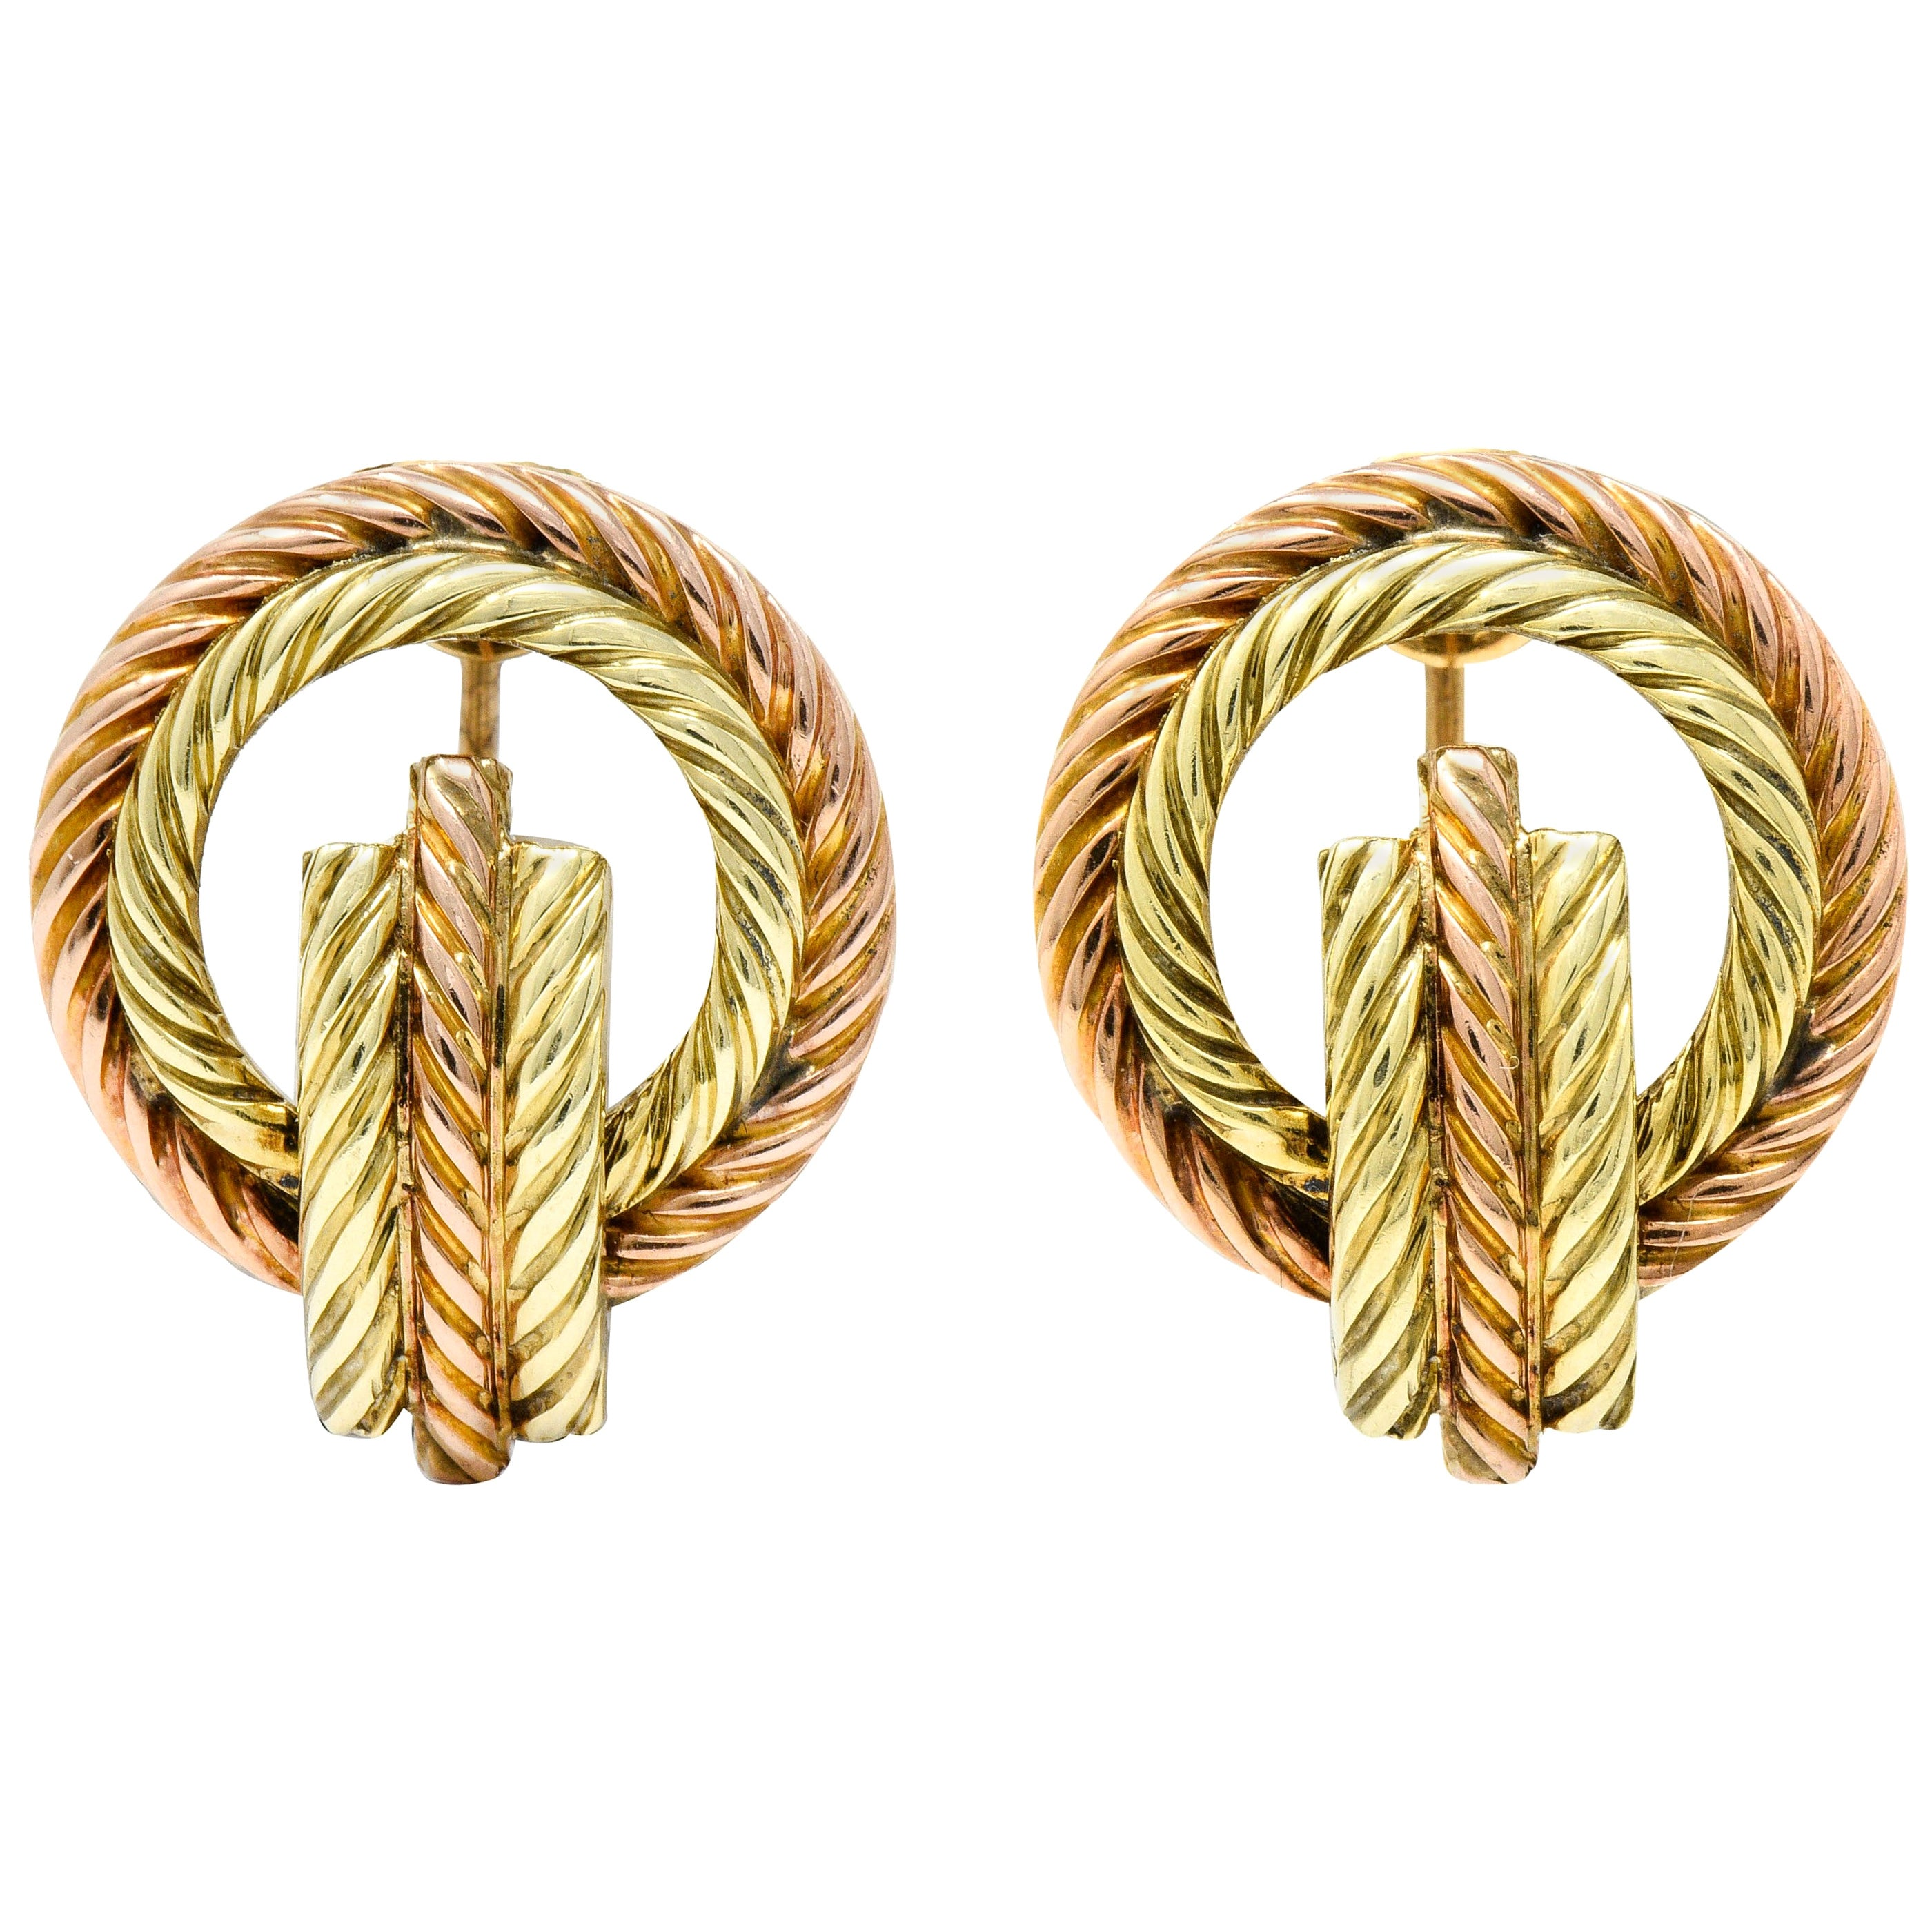 Tiffany & Co. Retro 14 Karat Two-Tone Gold Twisted Rope Screwback Earrings